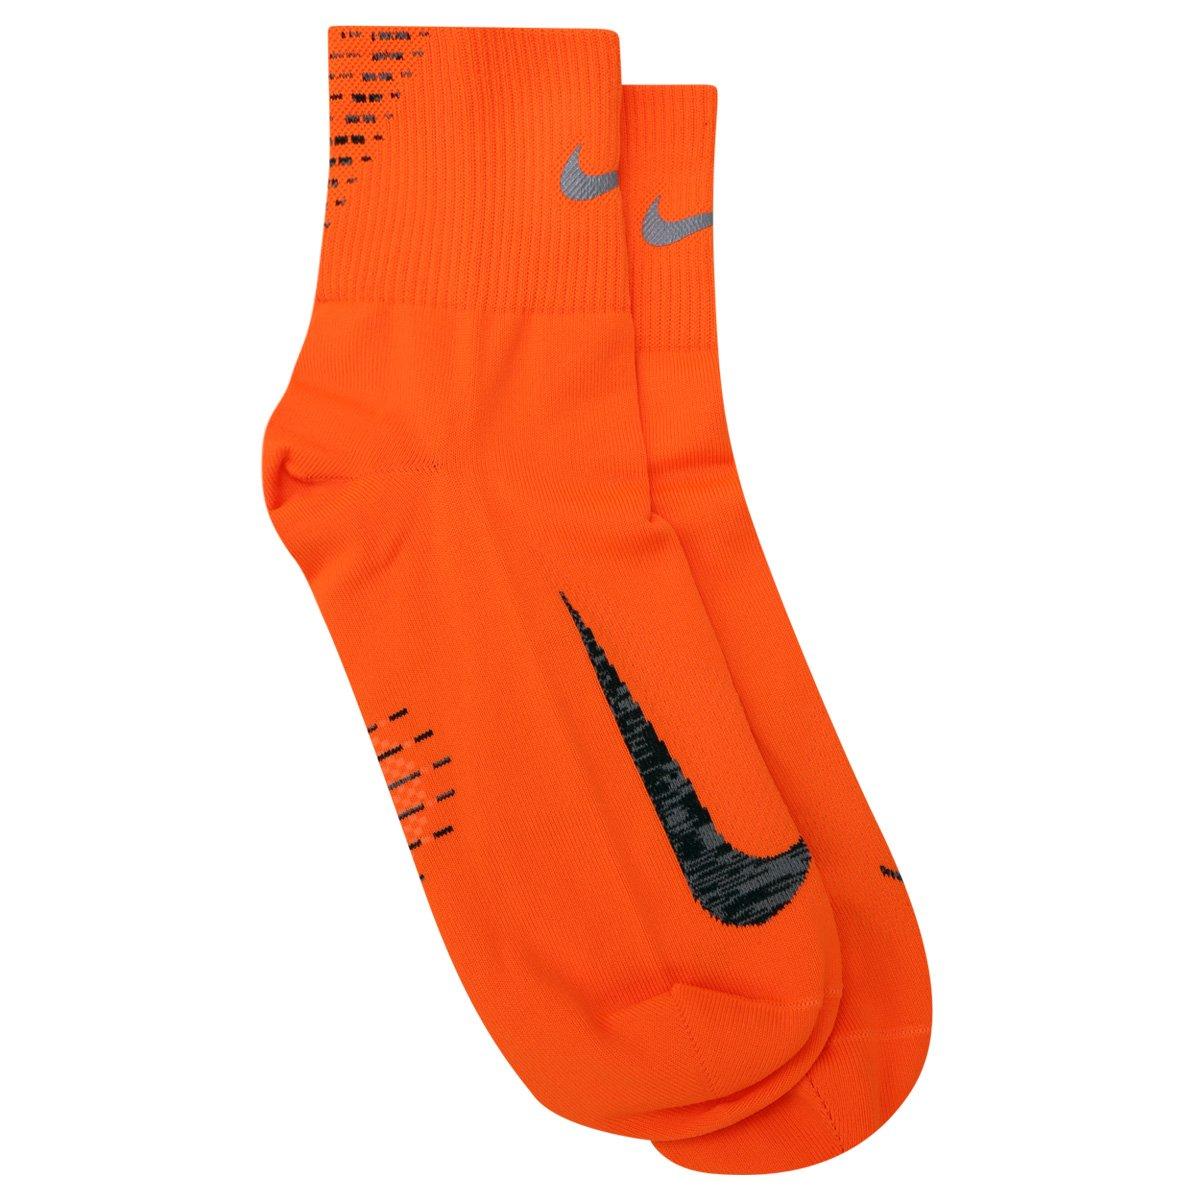 9b6a642802 Meia Nike Dri-Fit Elite Running Lightweight 2.0 - Compre Agora ...